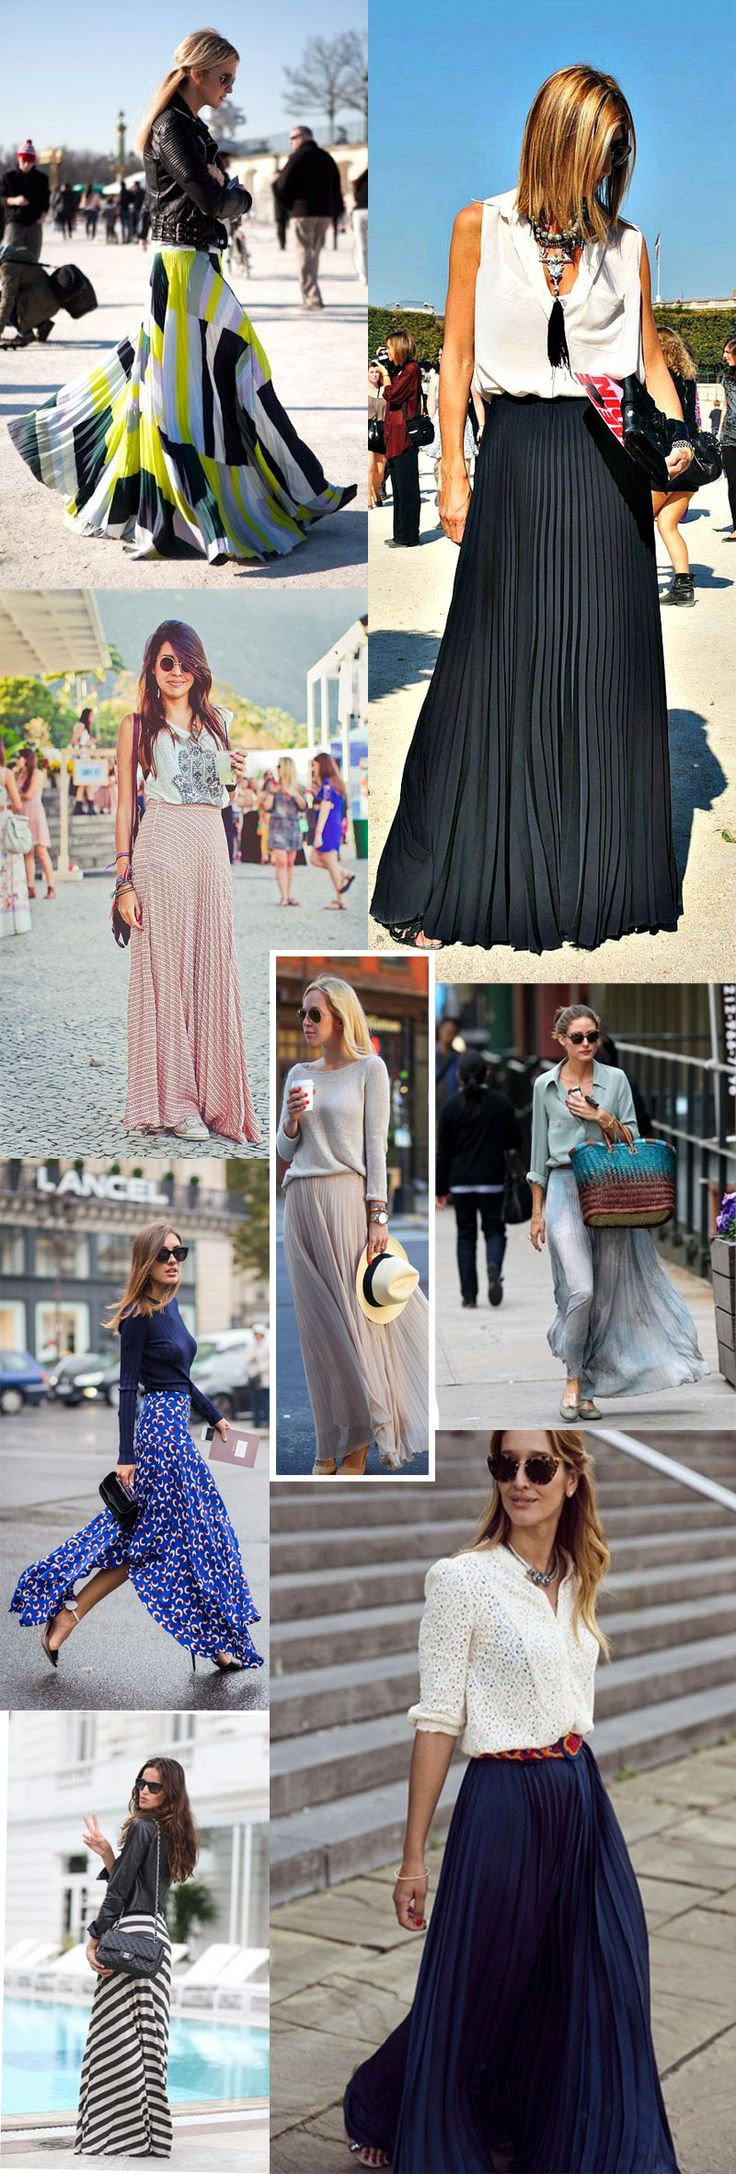 Saias Longas: Achados de Fast Fashion